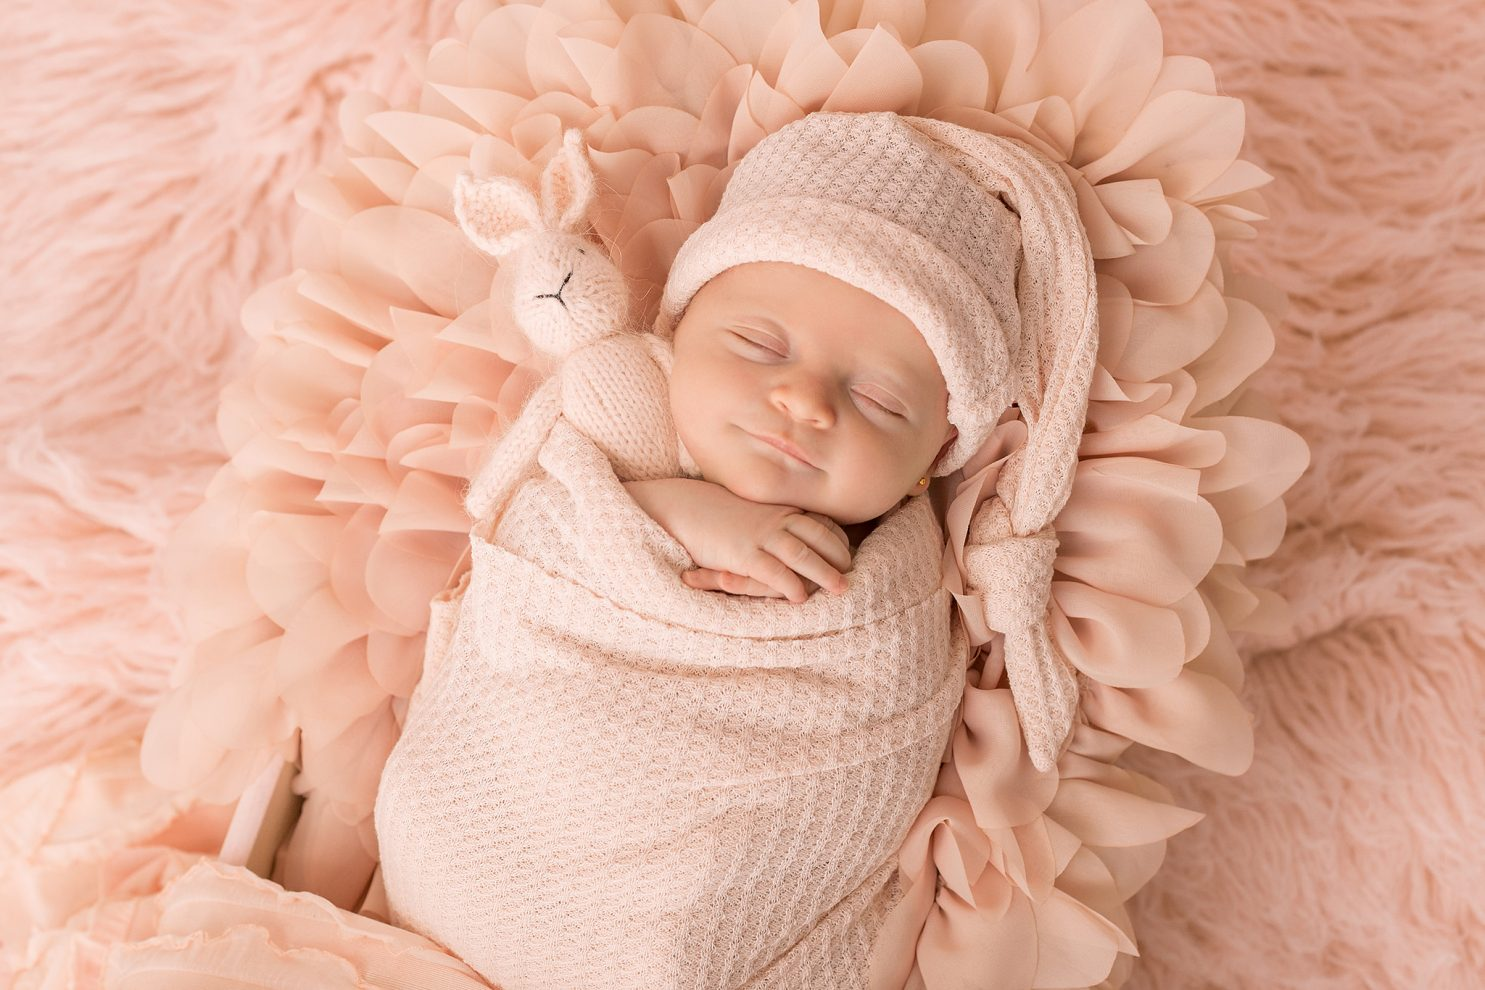 Contacta fotógrafo de recién nacido